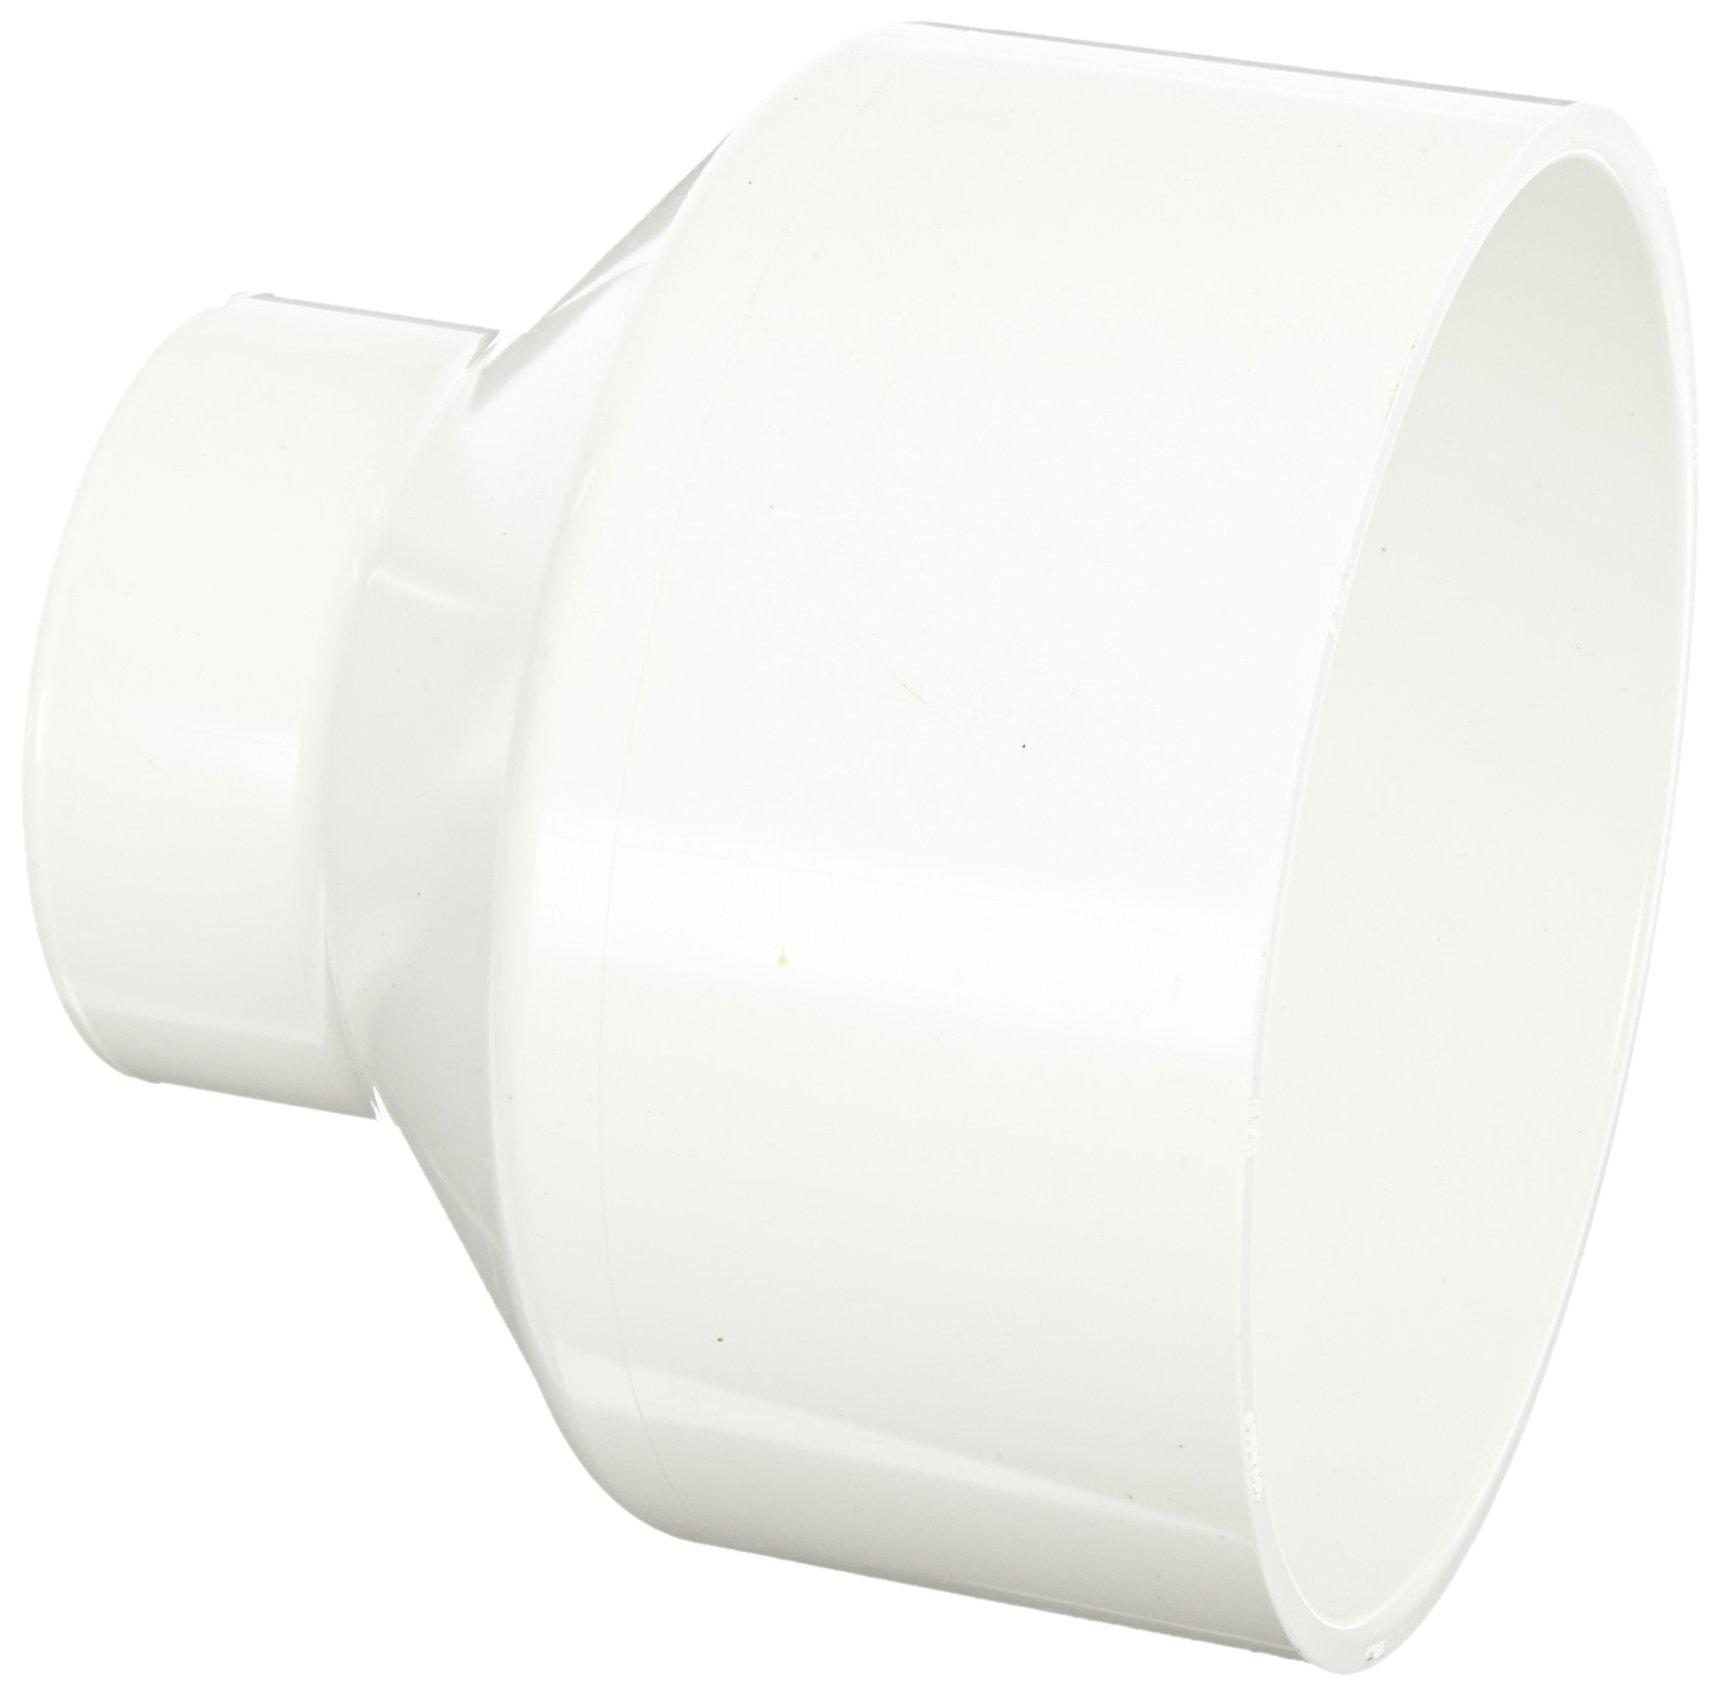 Spears P102 Series PVC DWV Pipe Fitting, Reducing Coupling, 8'' x 4'' Hub